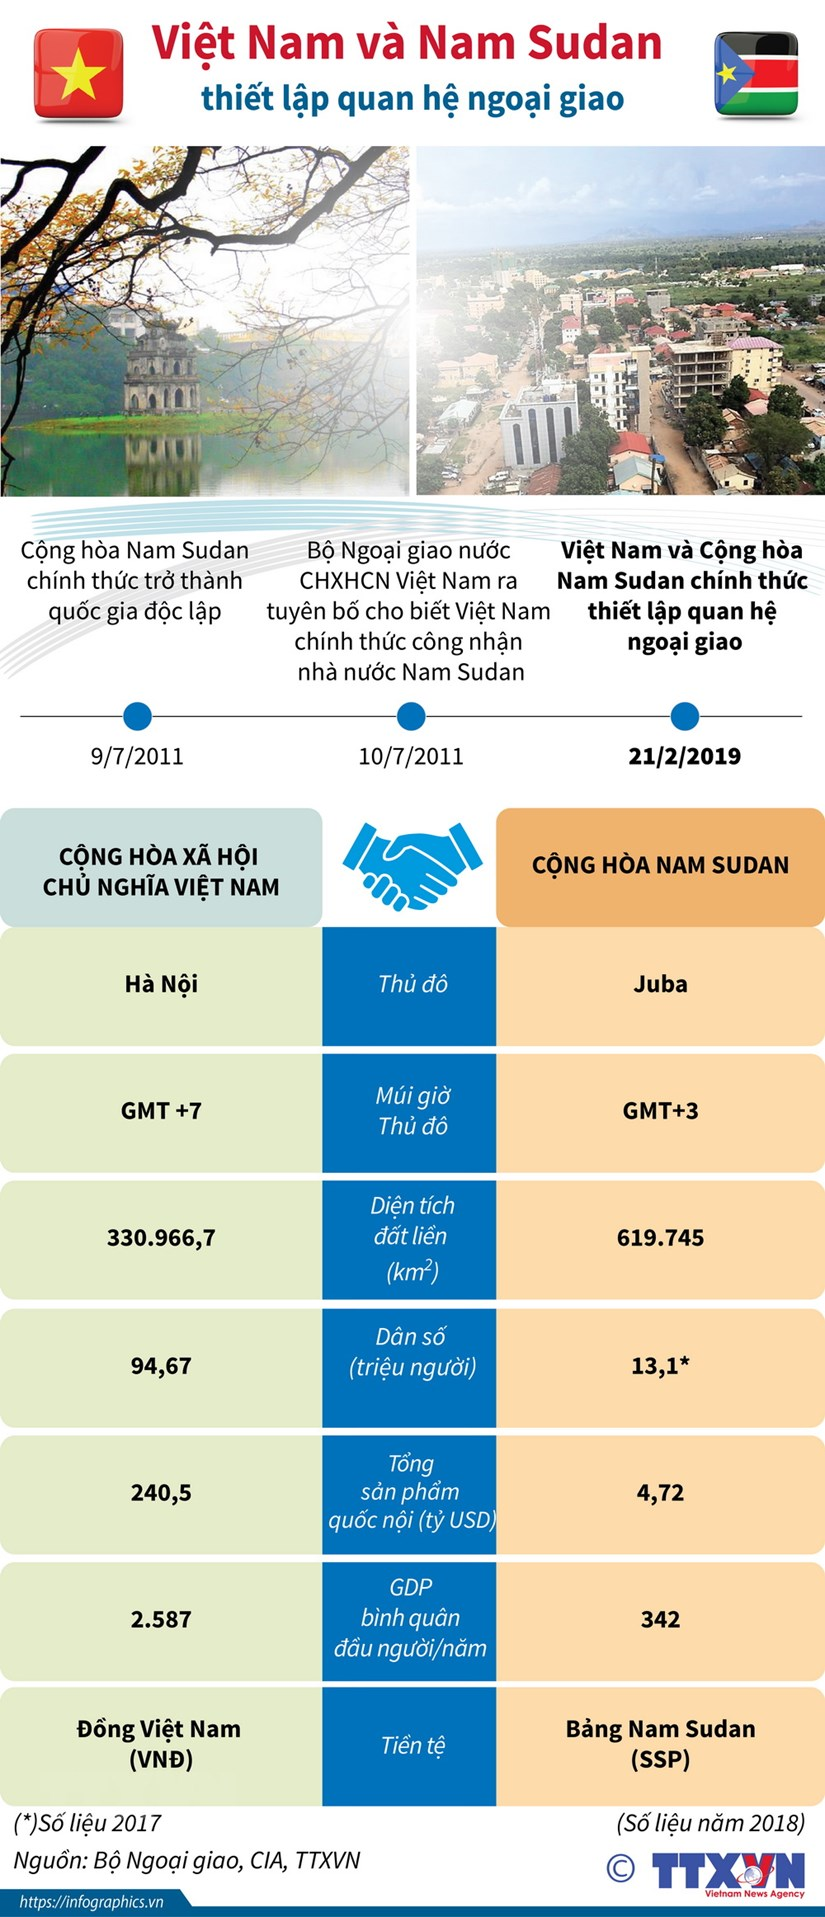 [Infographics] Viet Nam va Nam Sudan thiet lap quan he ngoai giao hinh anh 1